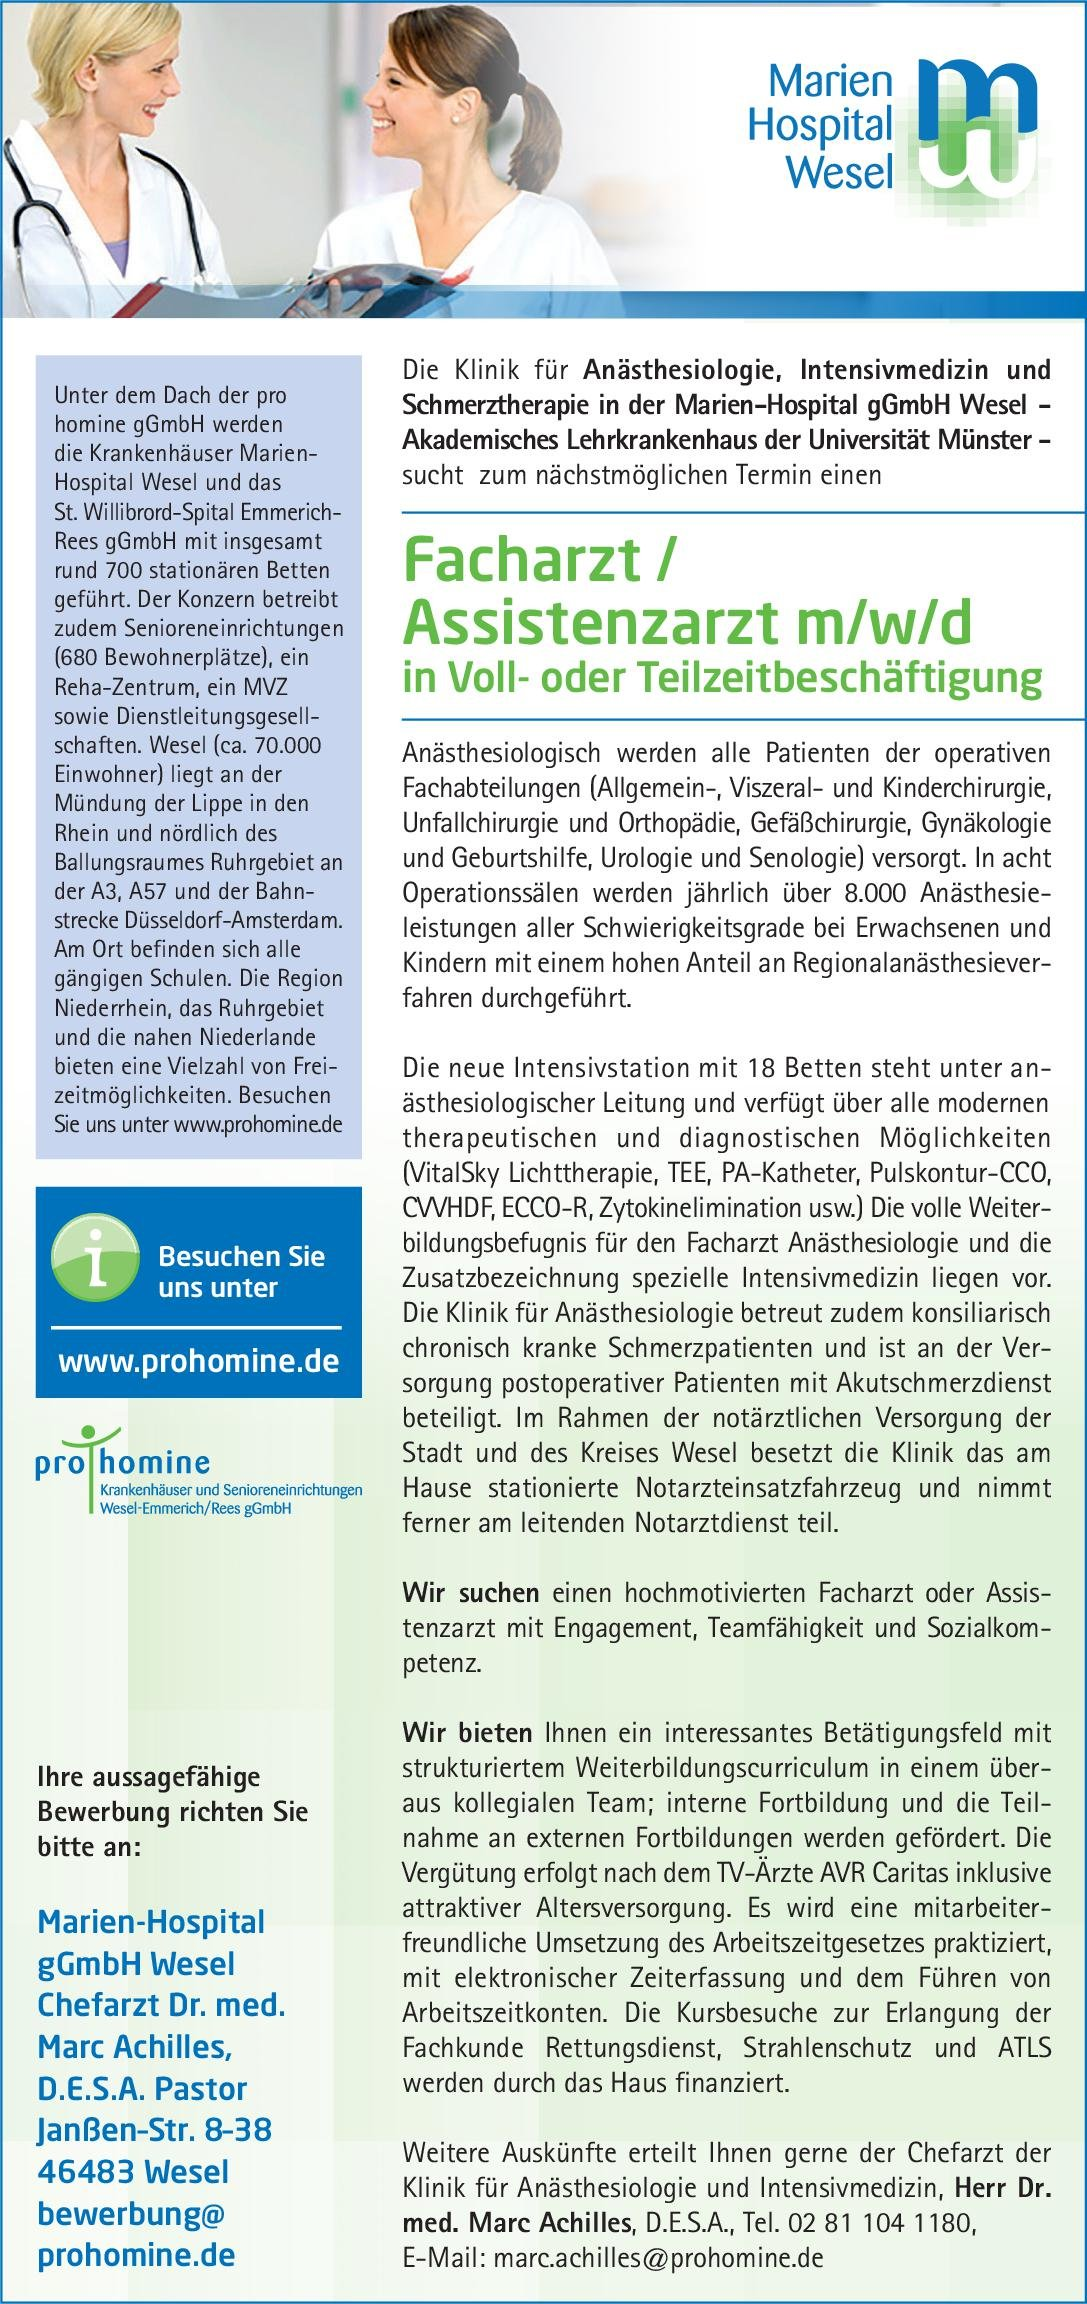 Marien-Hospital gGmbH Wesel Facharzt /Assistenzarzt m/w/d Anästhesiologie Anästhesiologie / Intensivmedizin Arzt / Facharzt